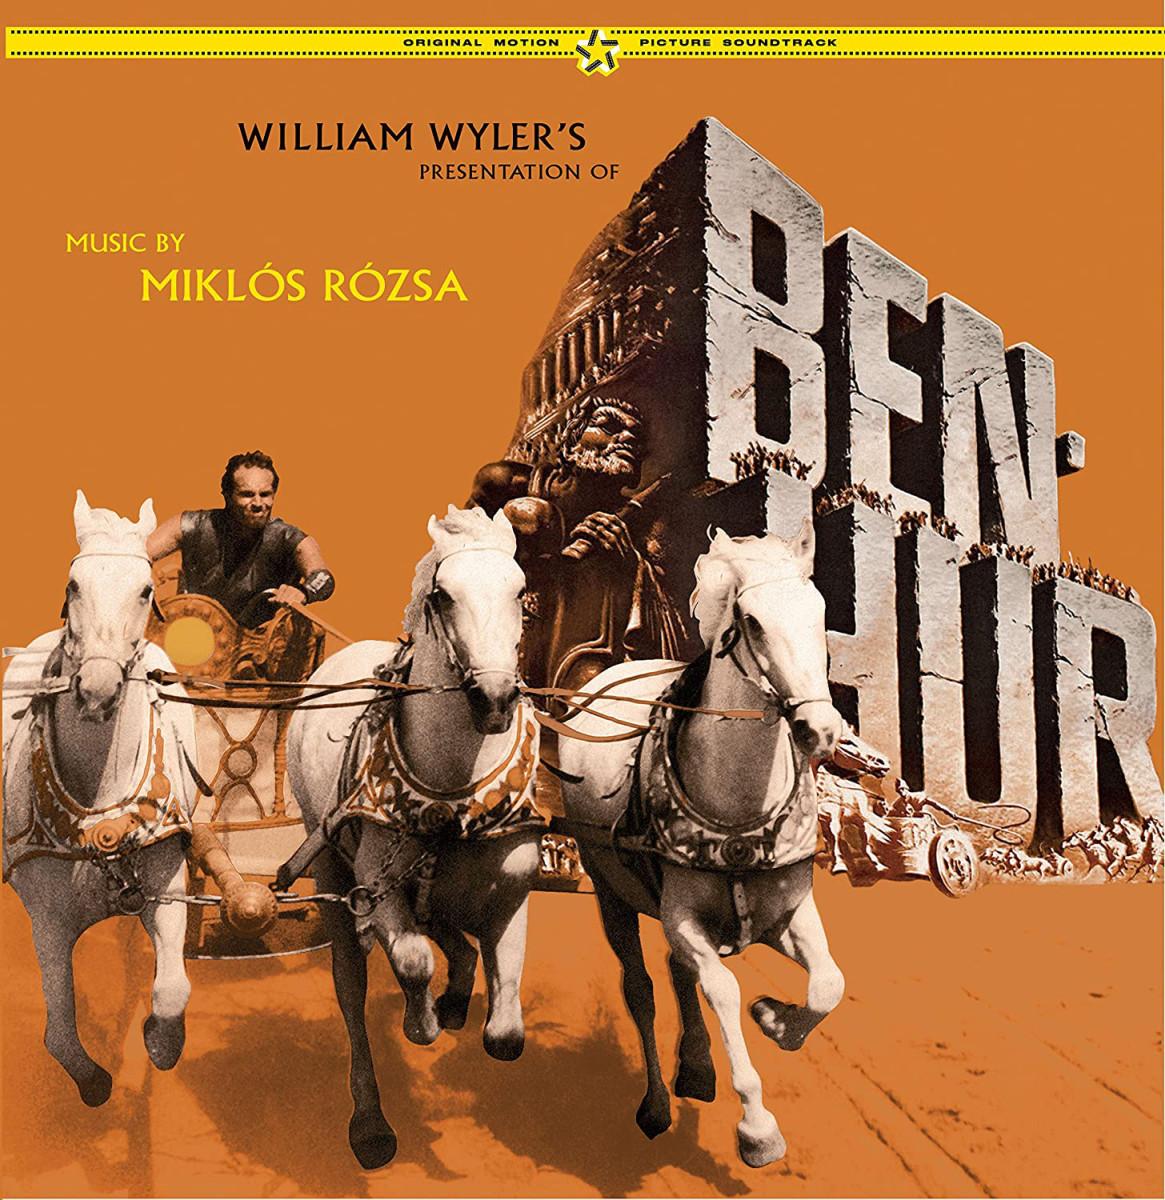 Music by Miklos Rozsa, Soundtrack album of William Wyler's Ben Hur